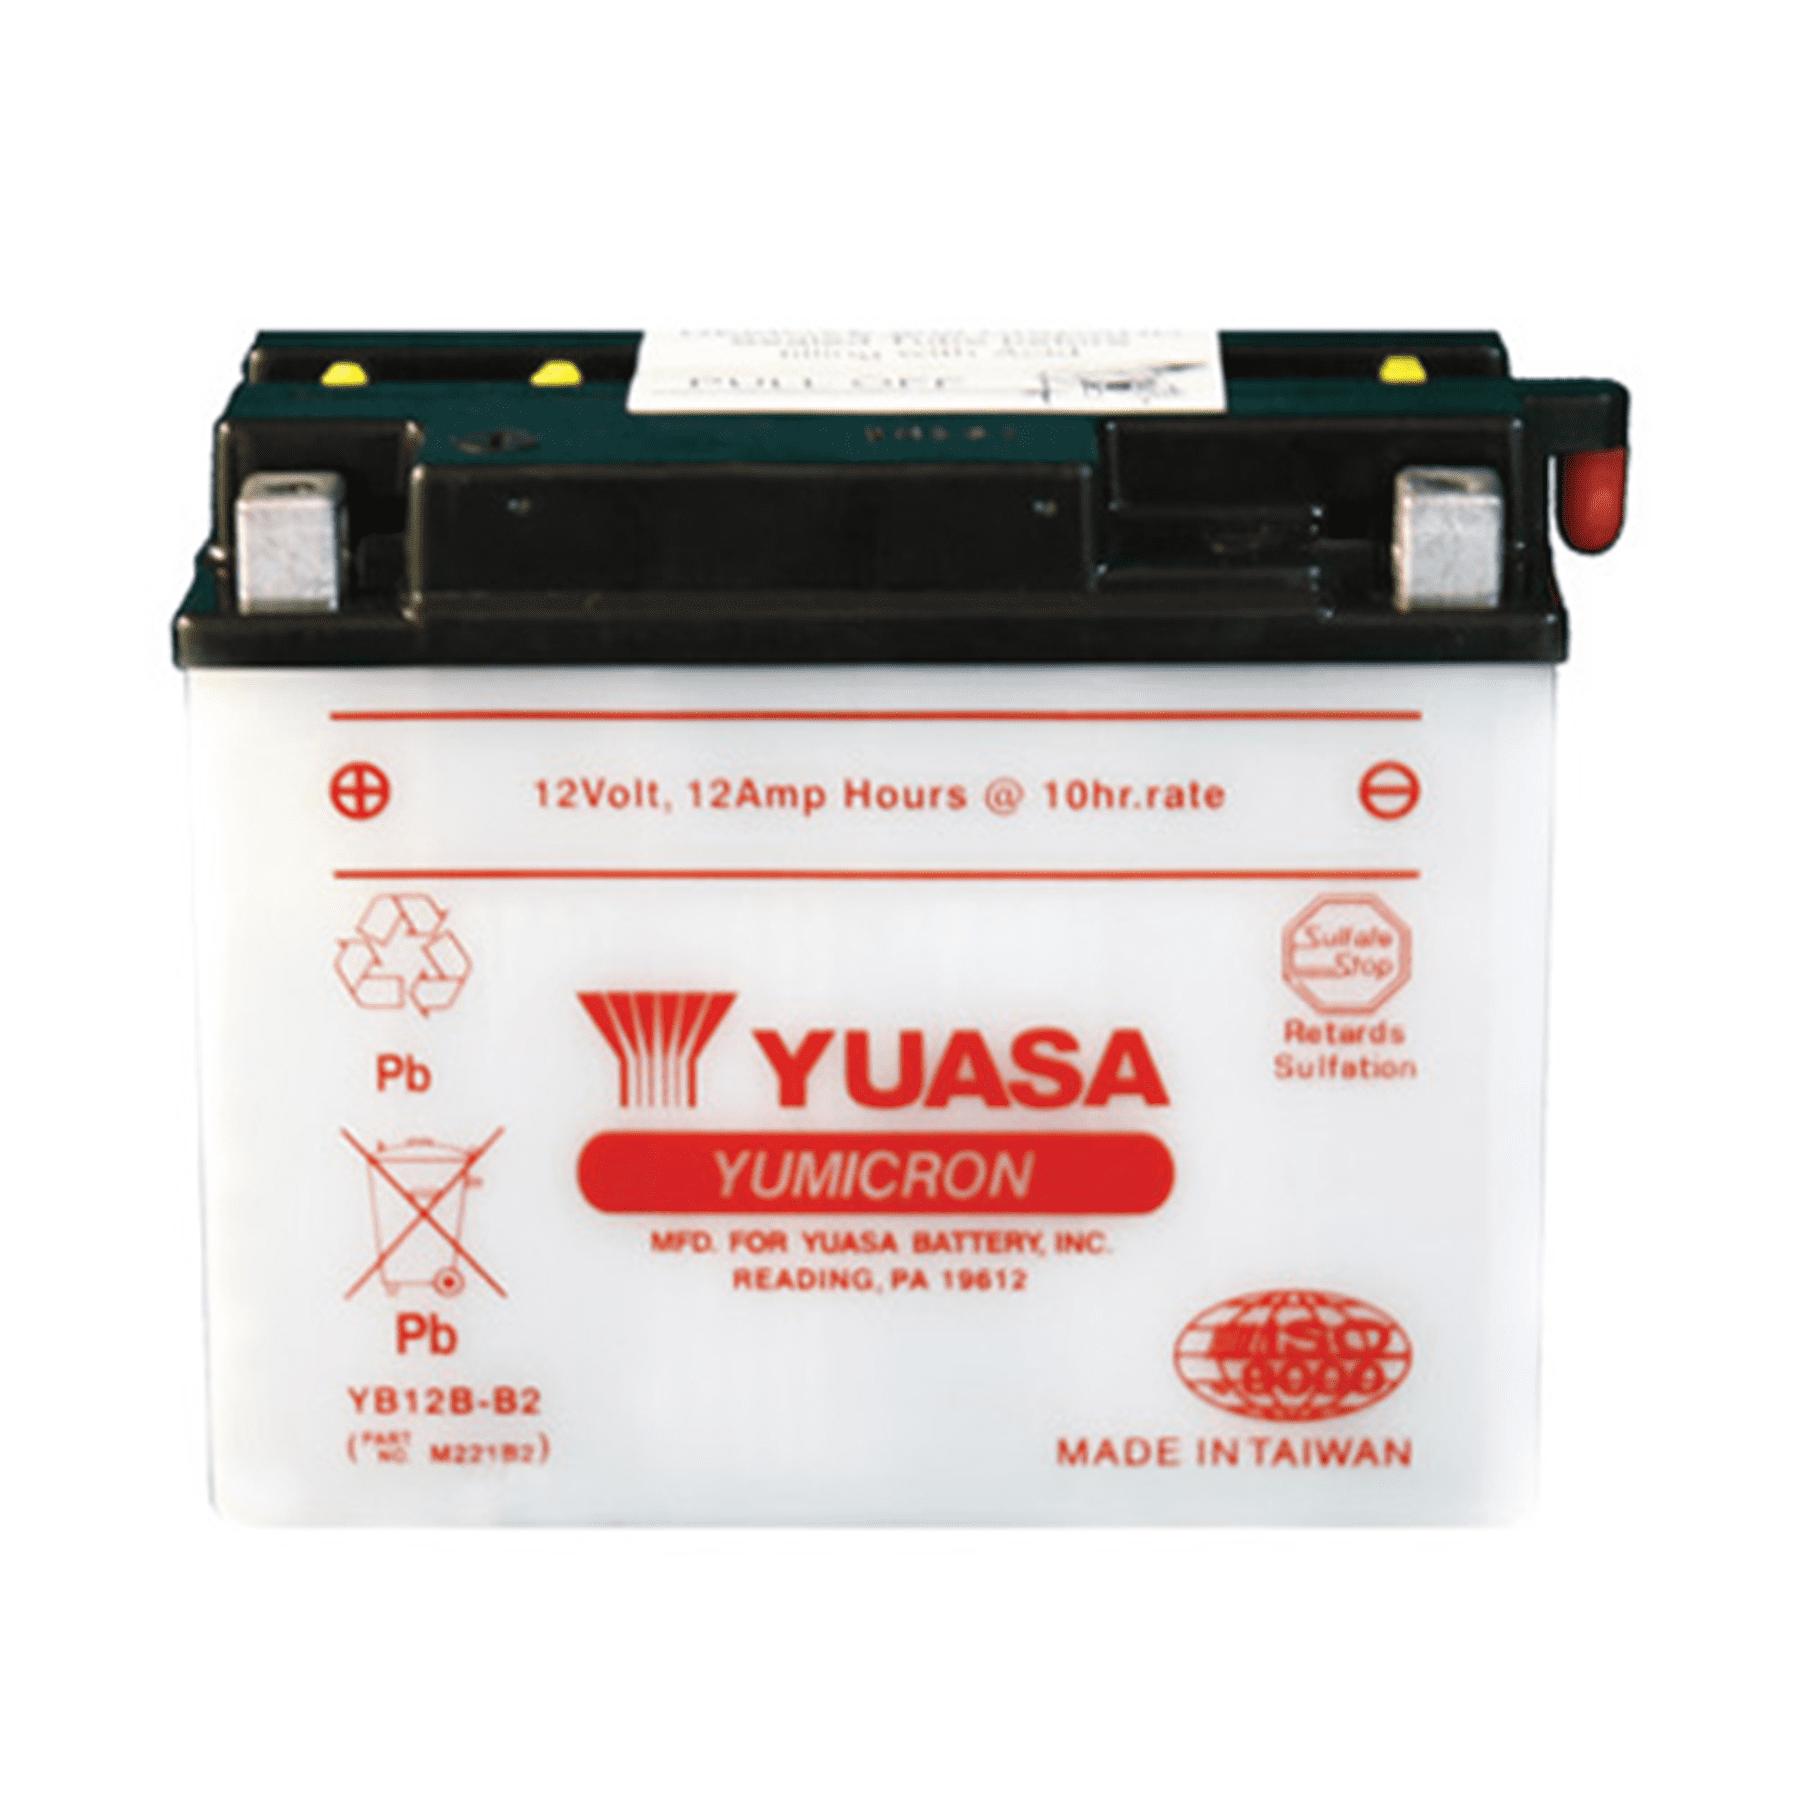 YUASA YB12B-B2 YUMICRON-12 VOLT BATTERY